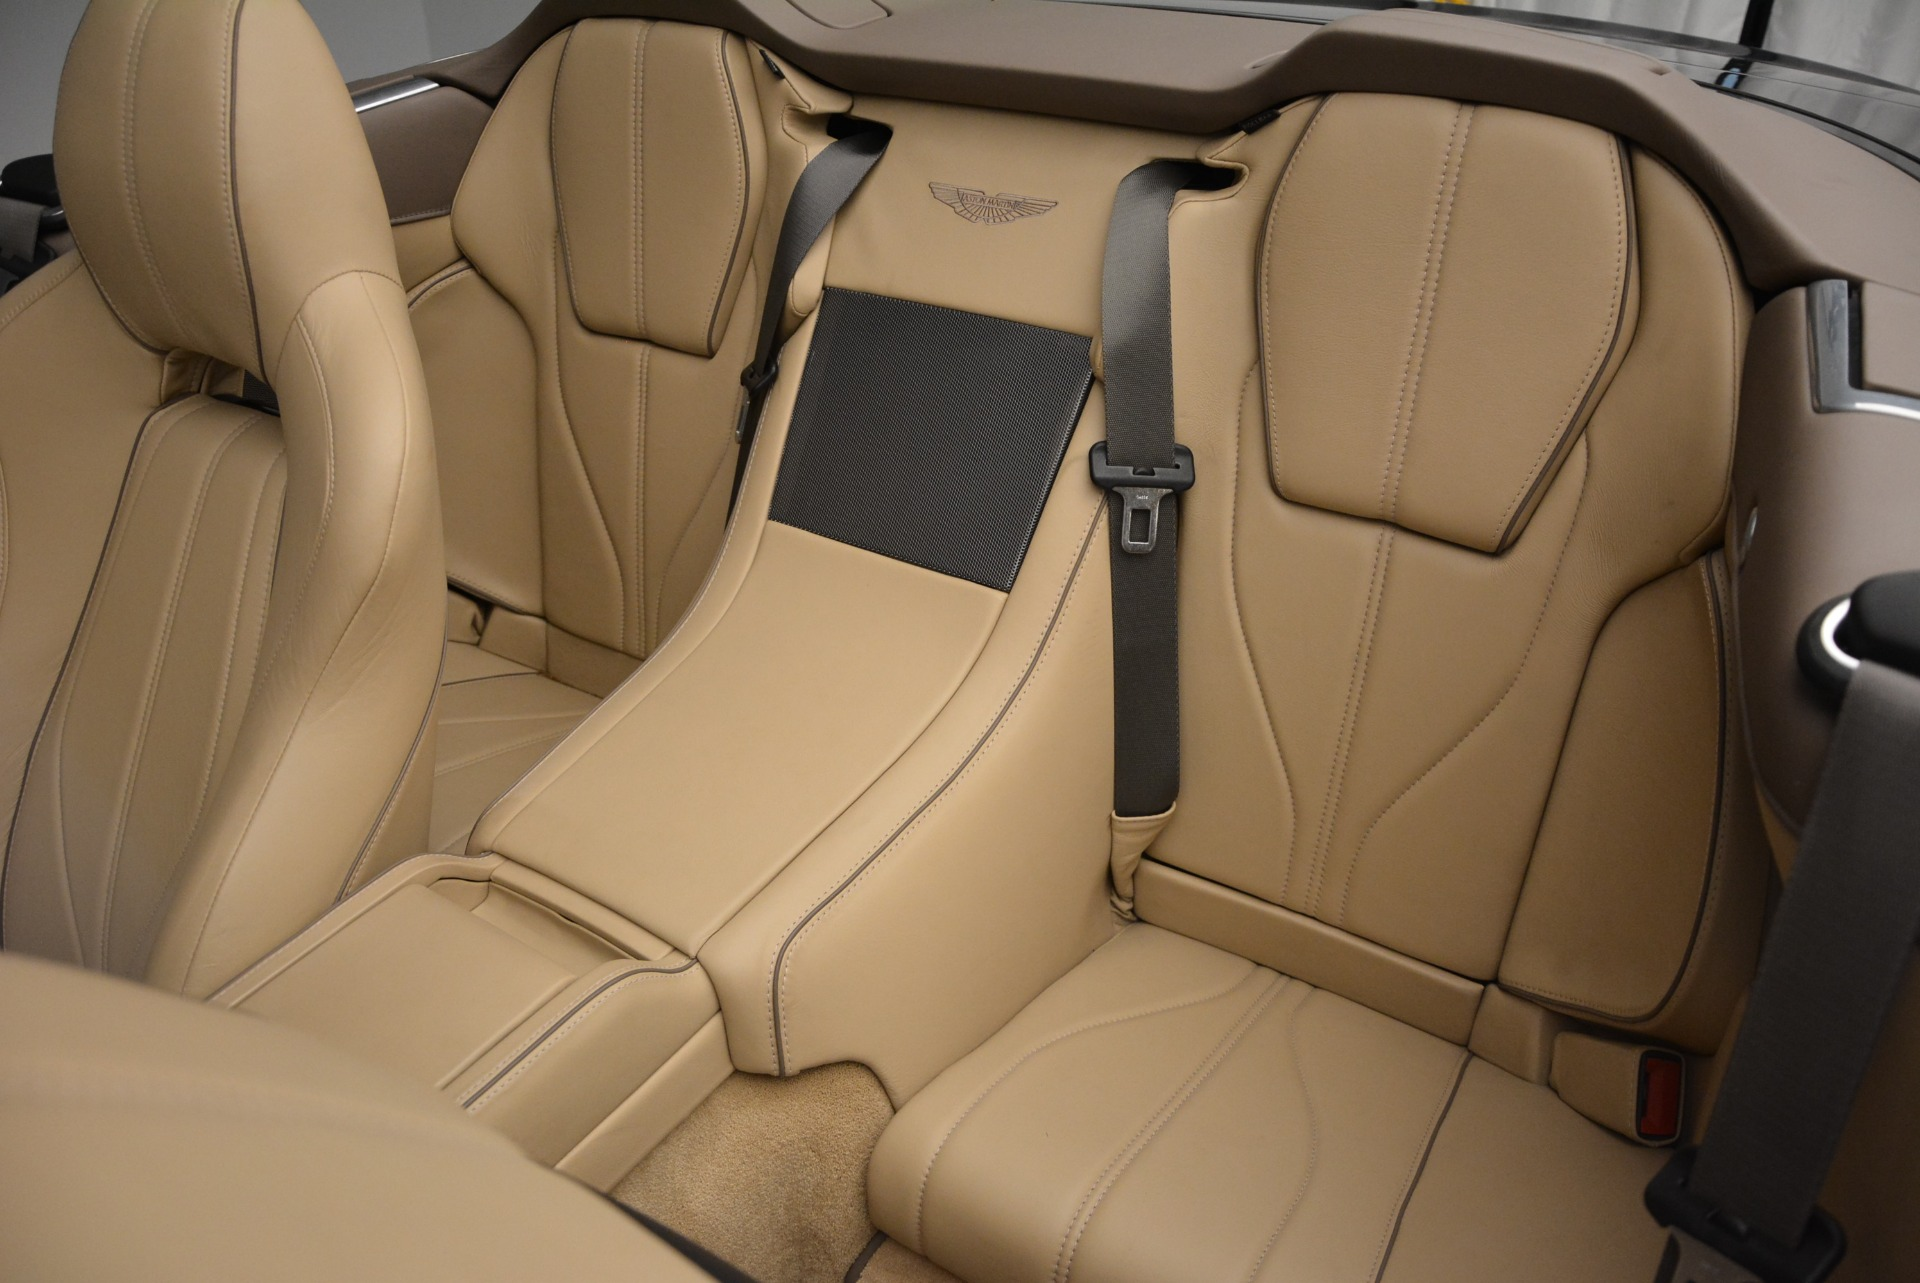 Used 2012 Aston Martin Virage Convertible For Sale In Greenwich, CT. Alfa Romeo of Greenwich, 7613 3351_p24